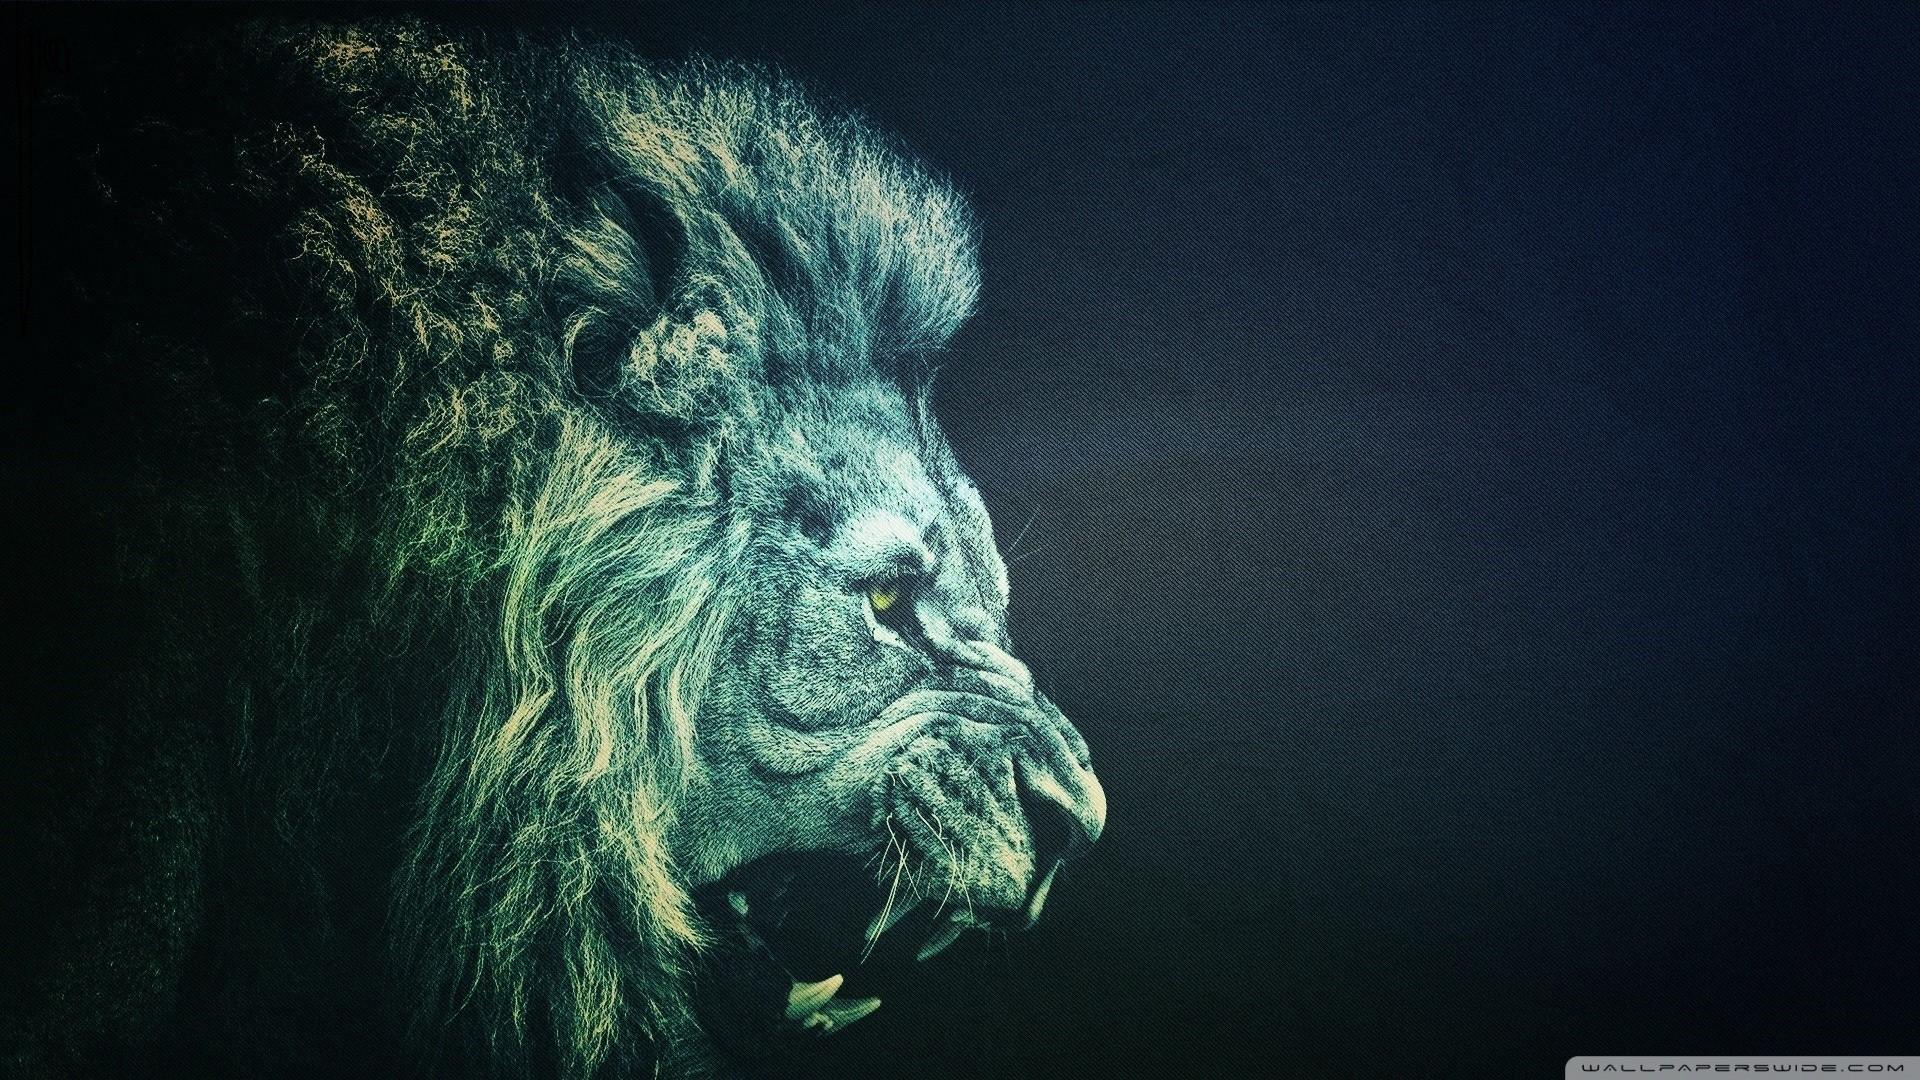 Roaring Lion Wallpaper 67 Images